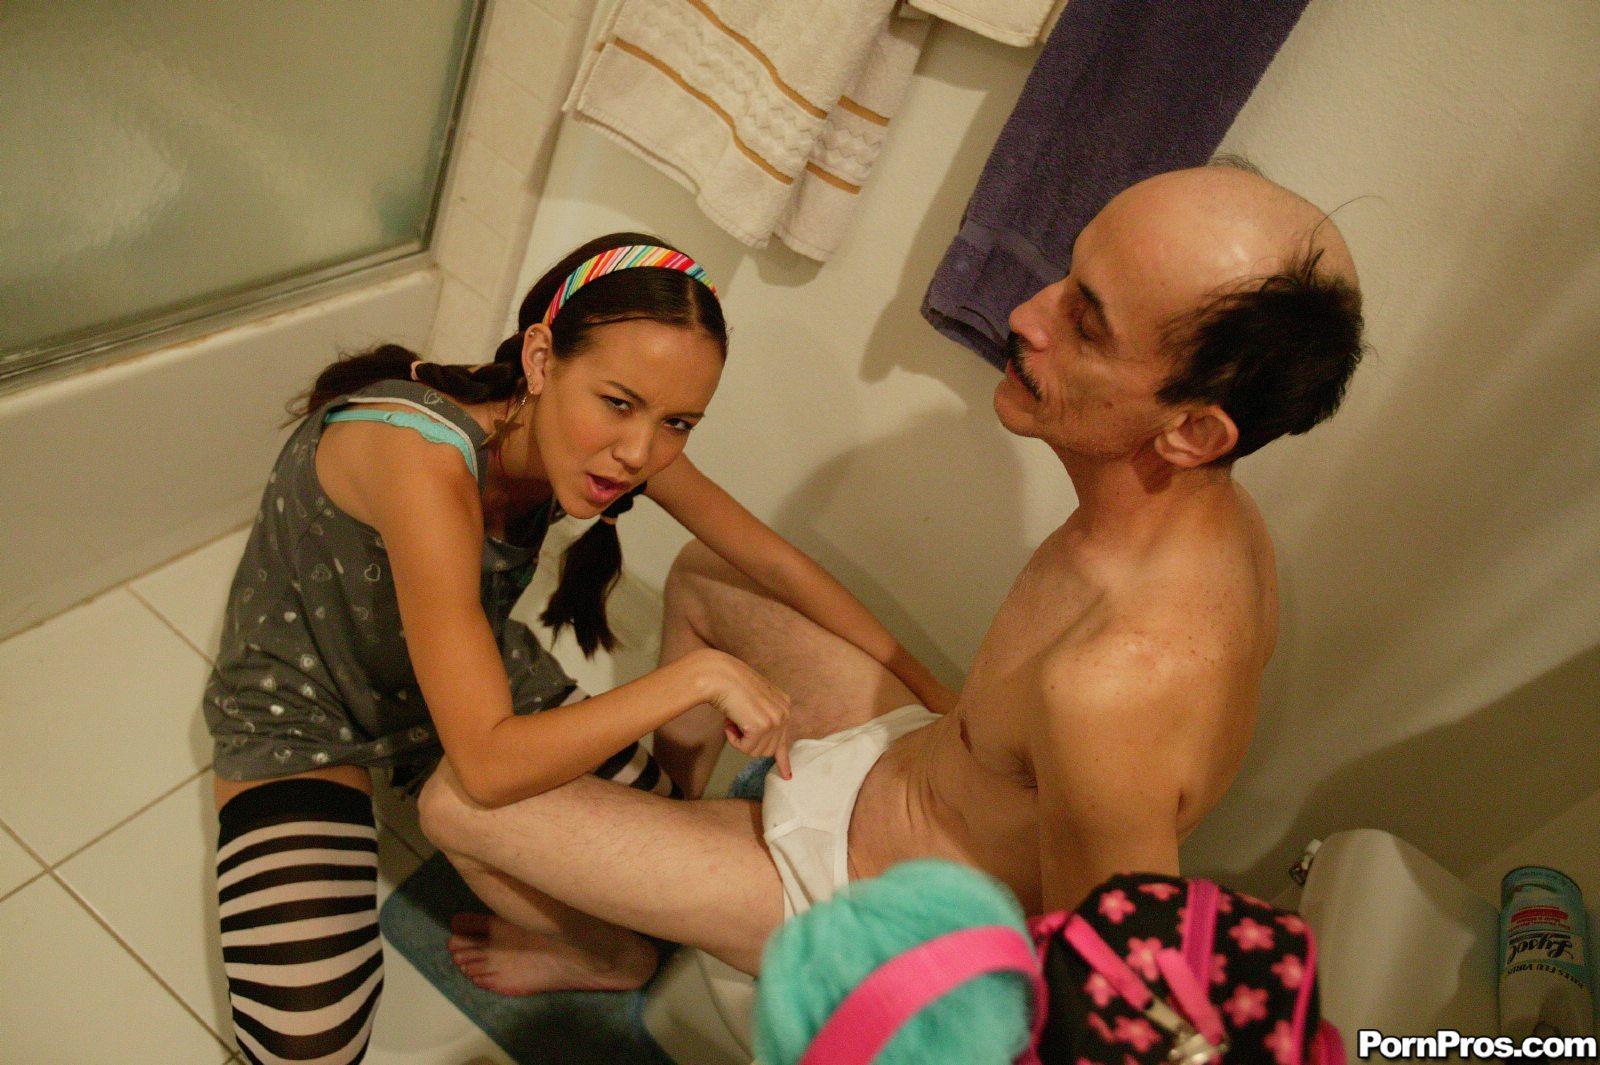 Maria ozawa asian milf deepthroats big cock before fingering hairy pussy 10